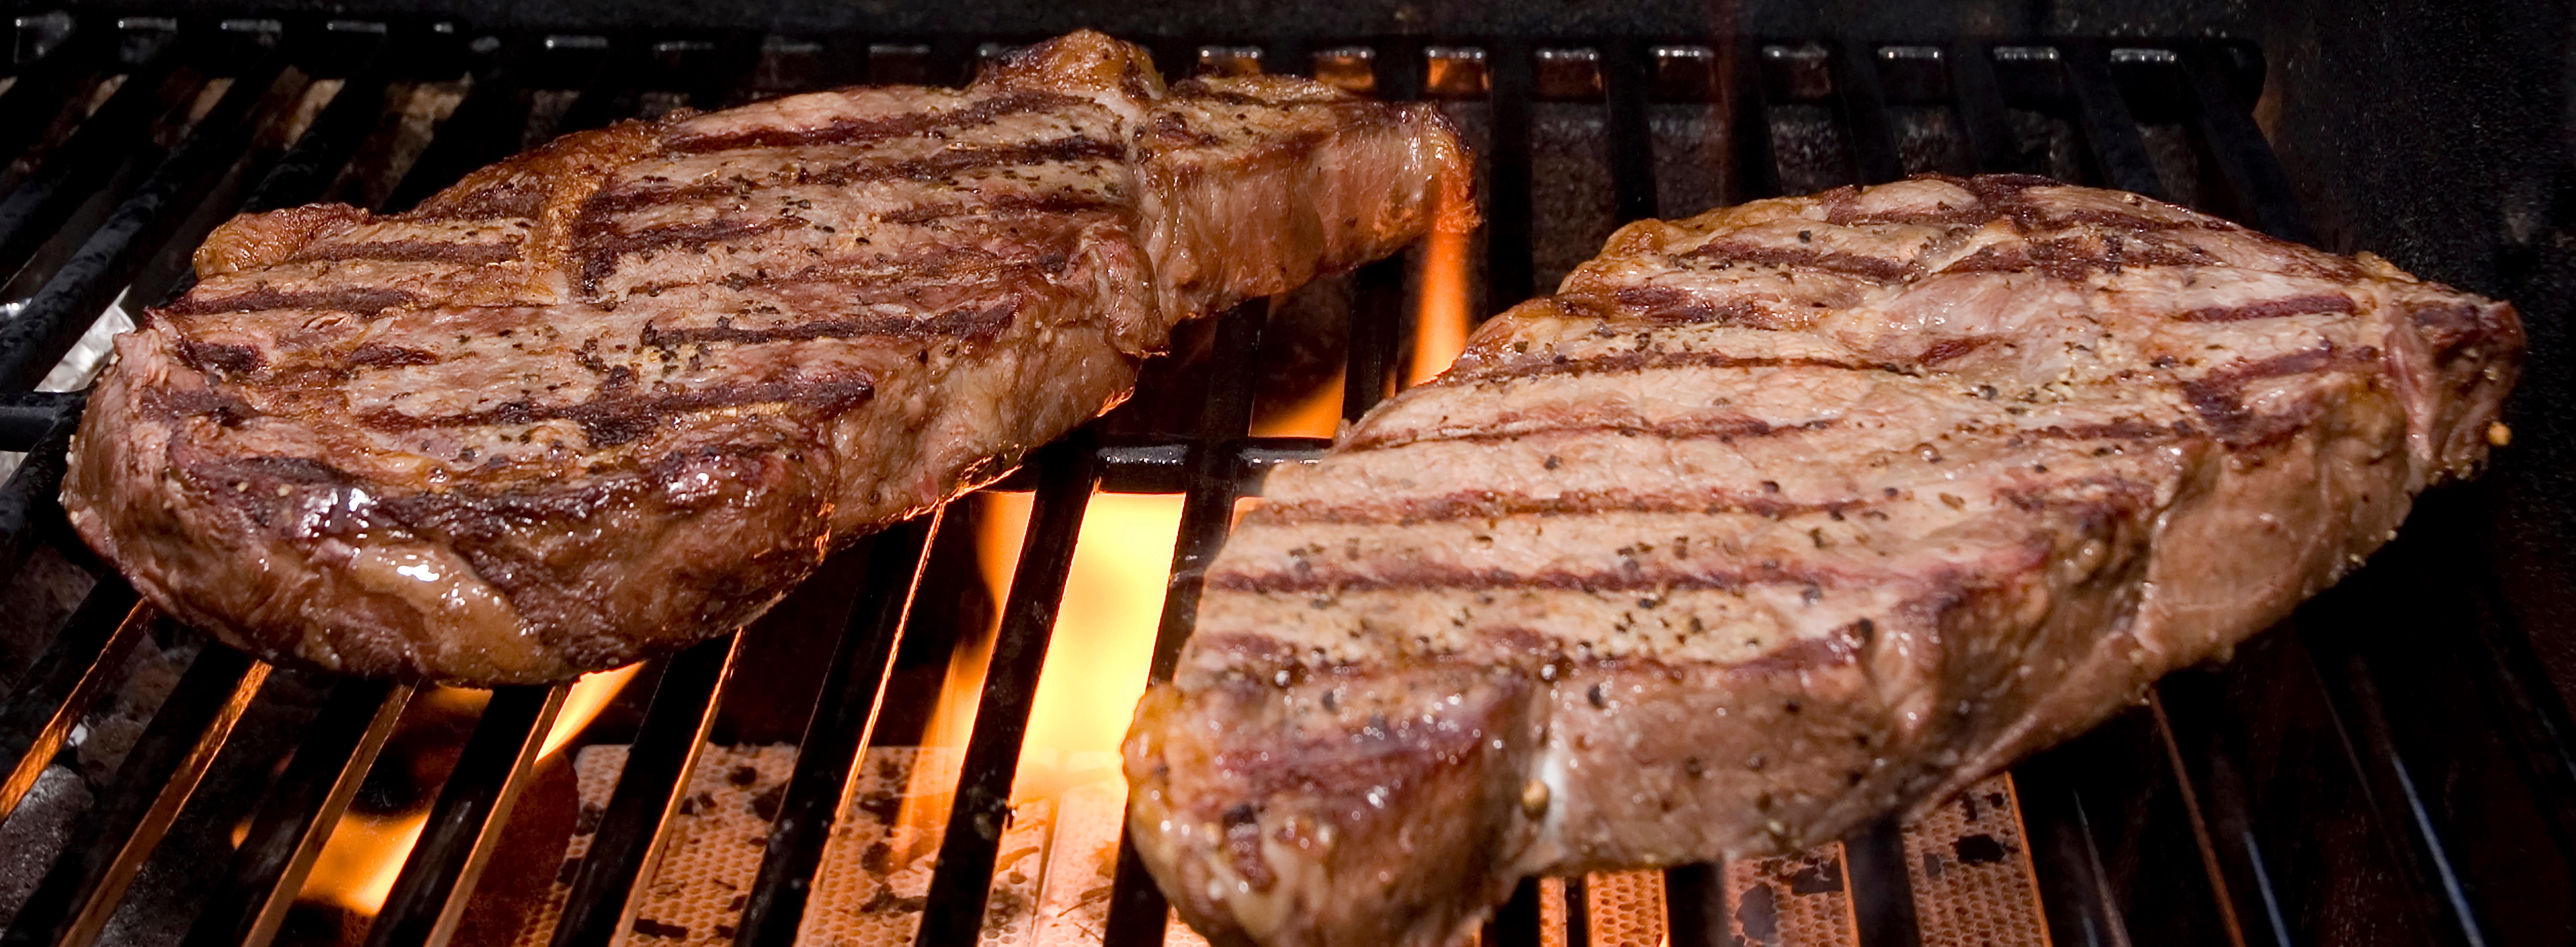 Perfect Grilled Steak The perfect grilled steak standard market